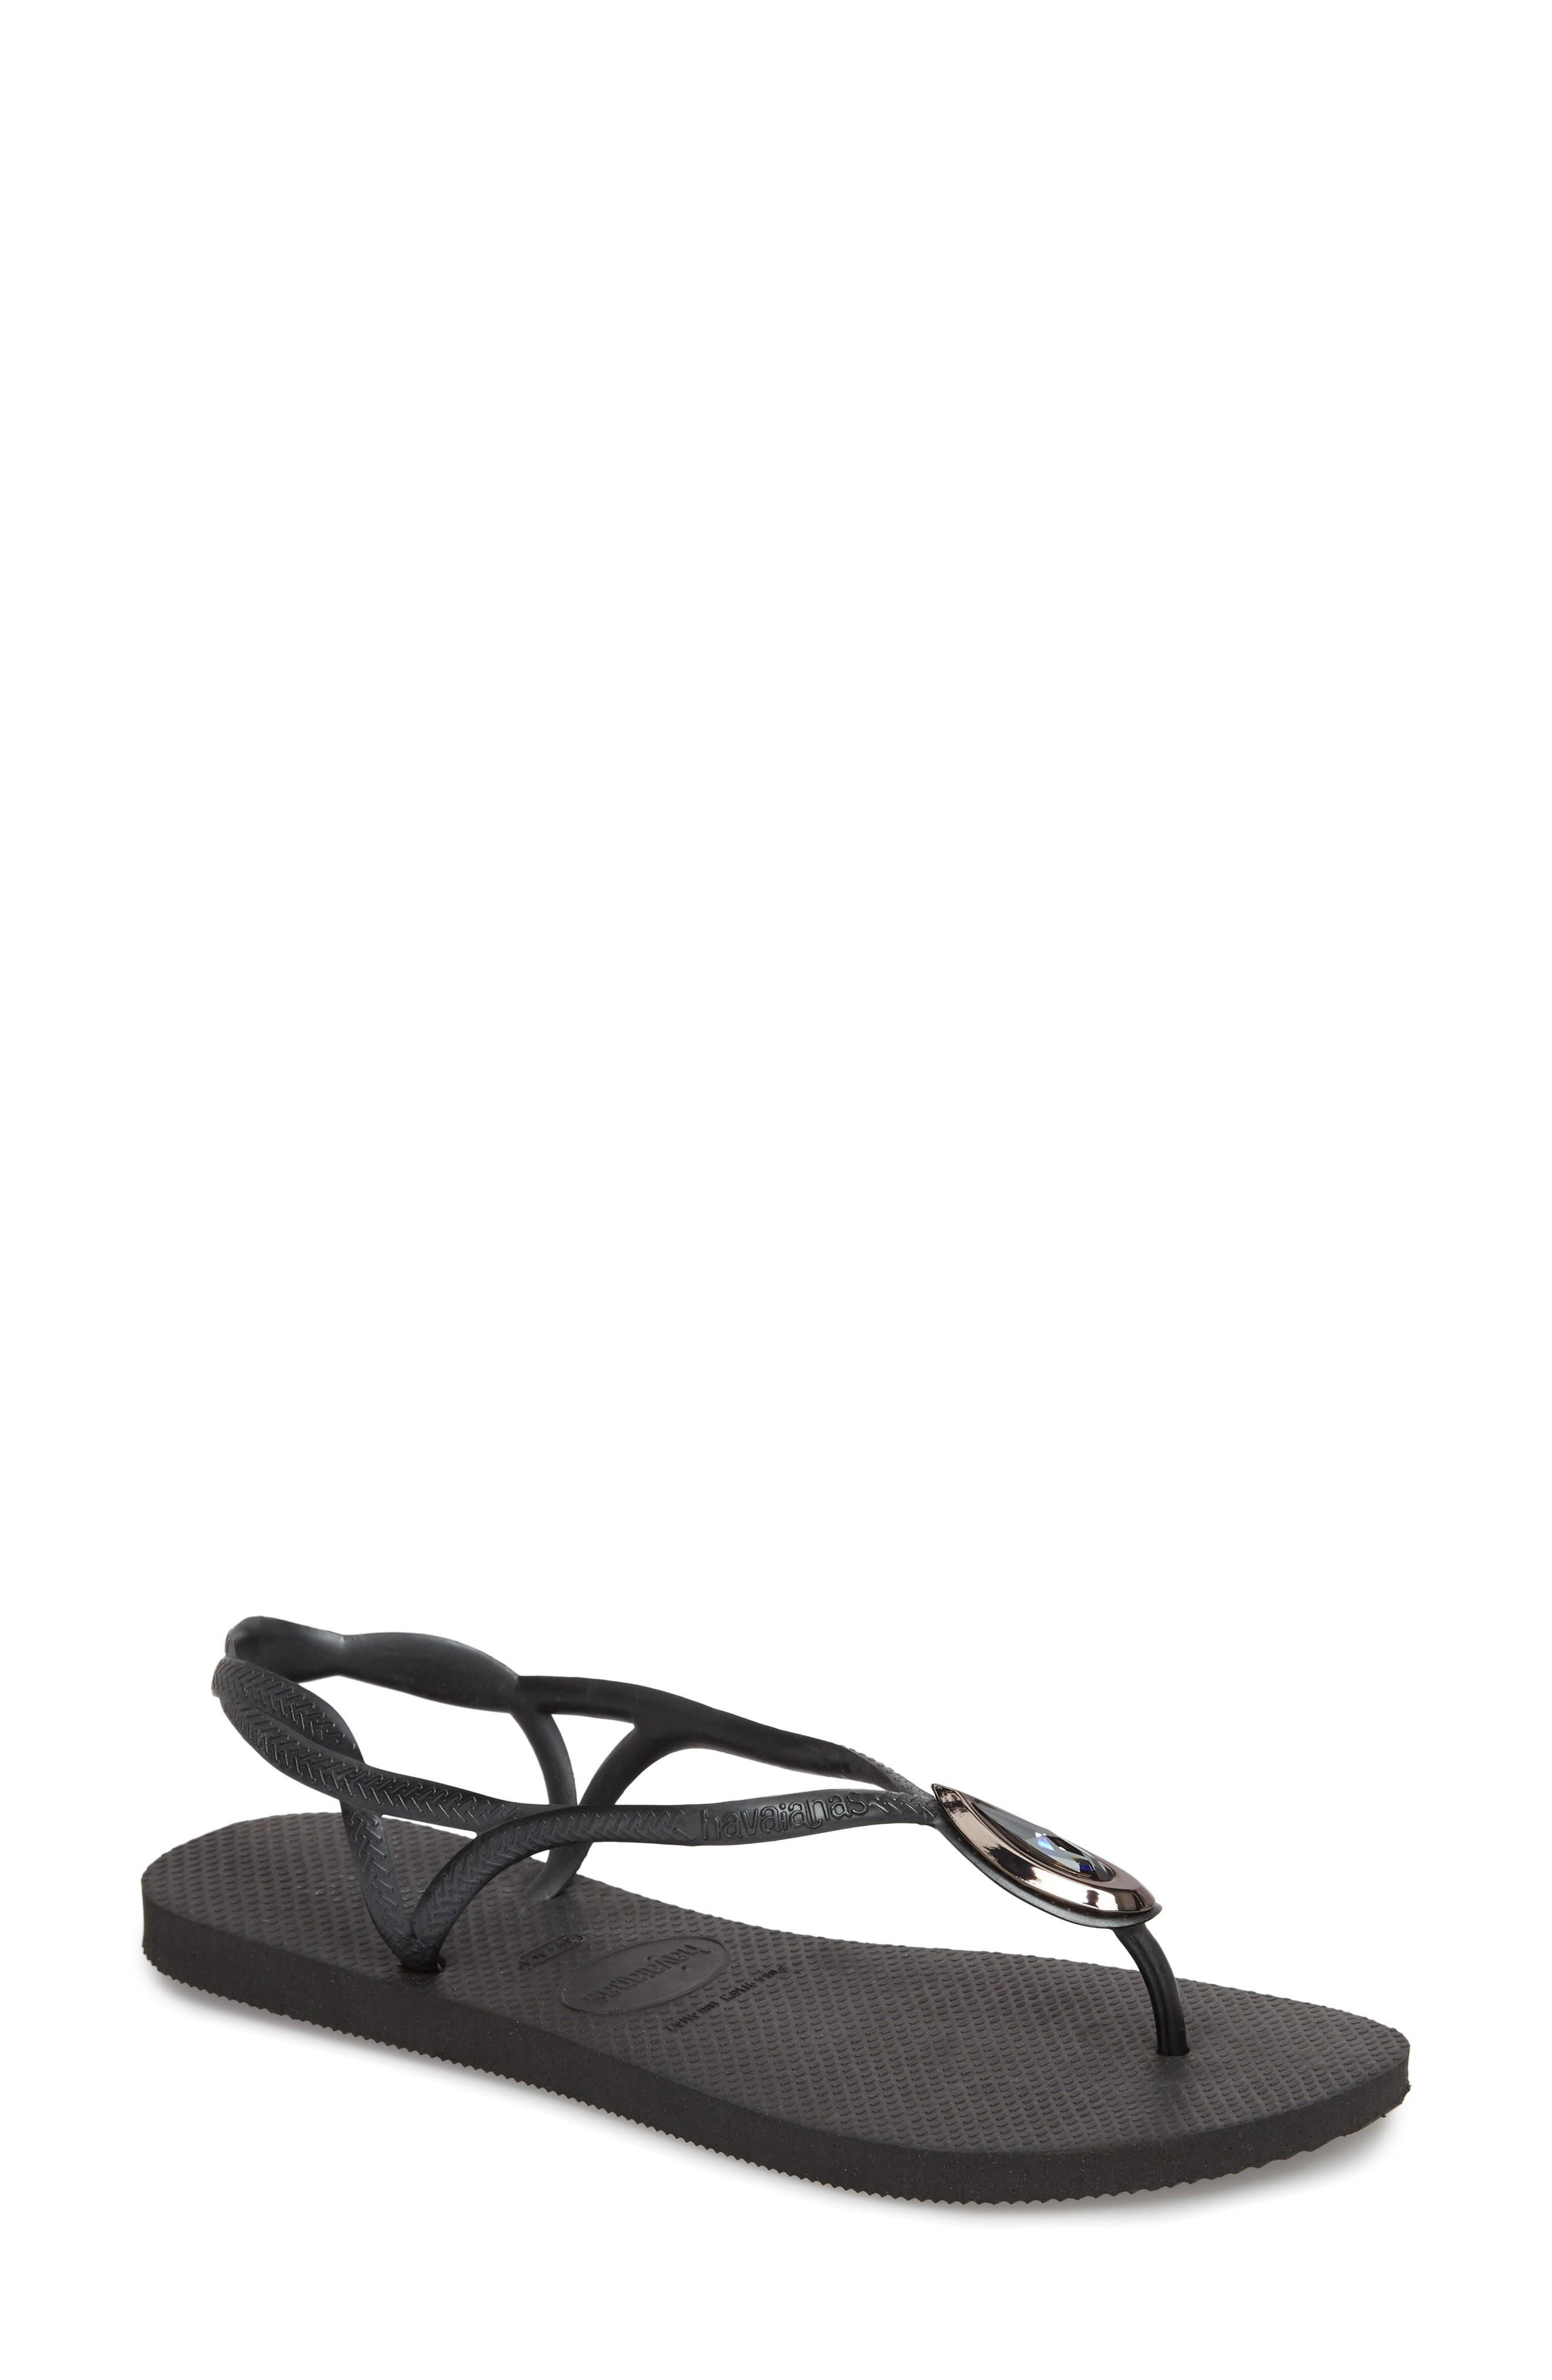 c3001b3a4 Havaianas Luna Sandal In Black  Black